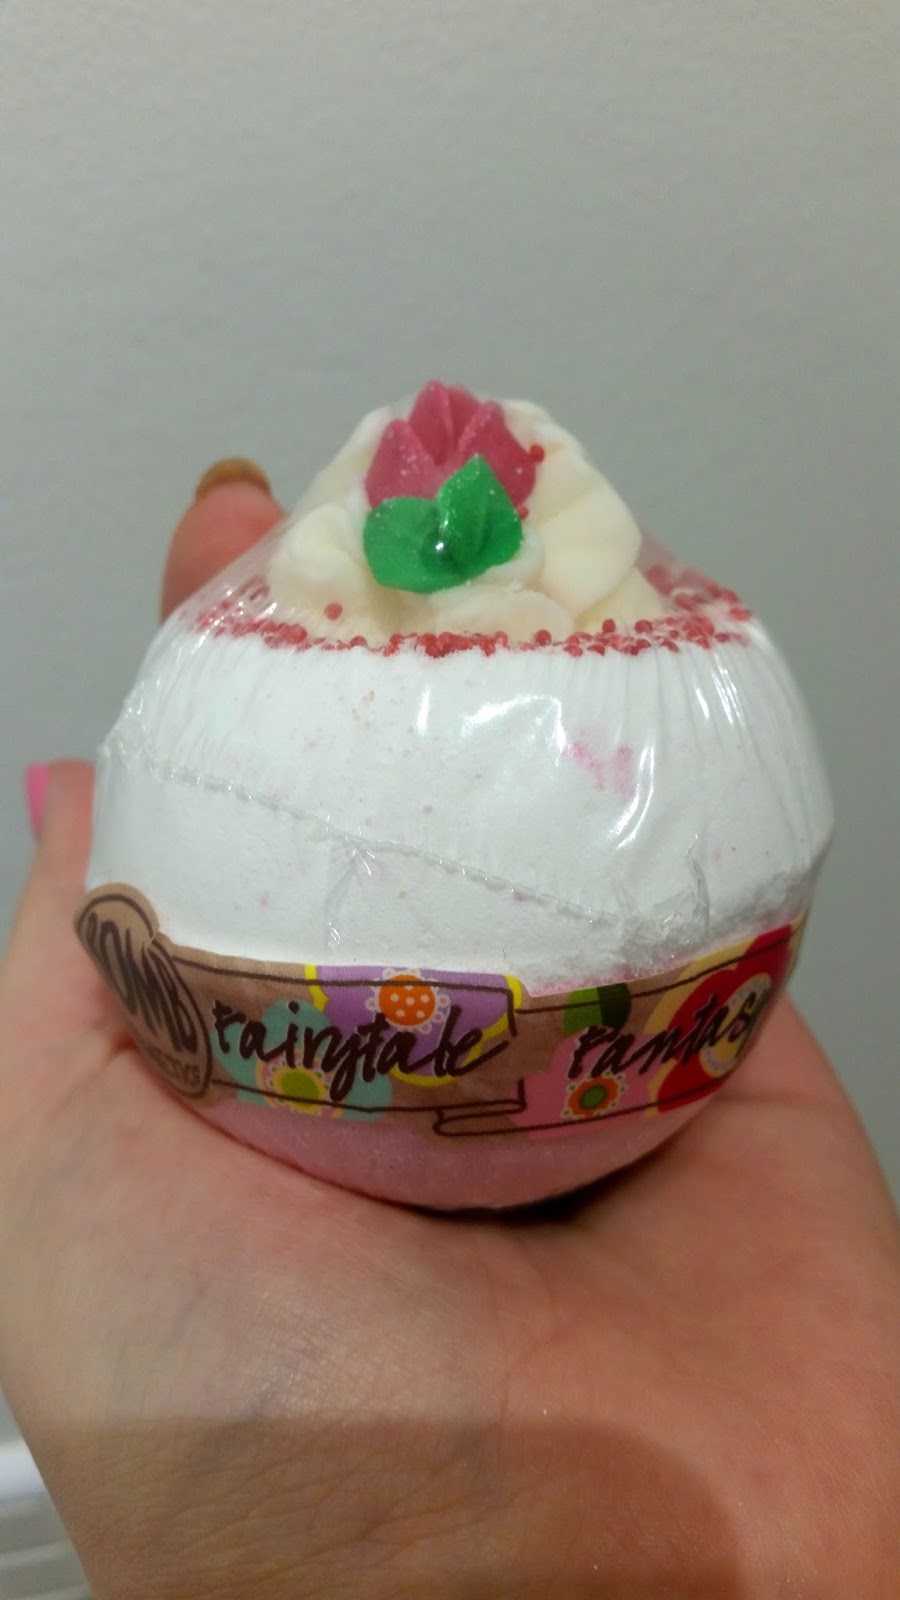 Bomb Cosmetics Fairytale Fantasy Bath Blaster